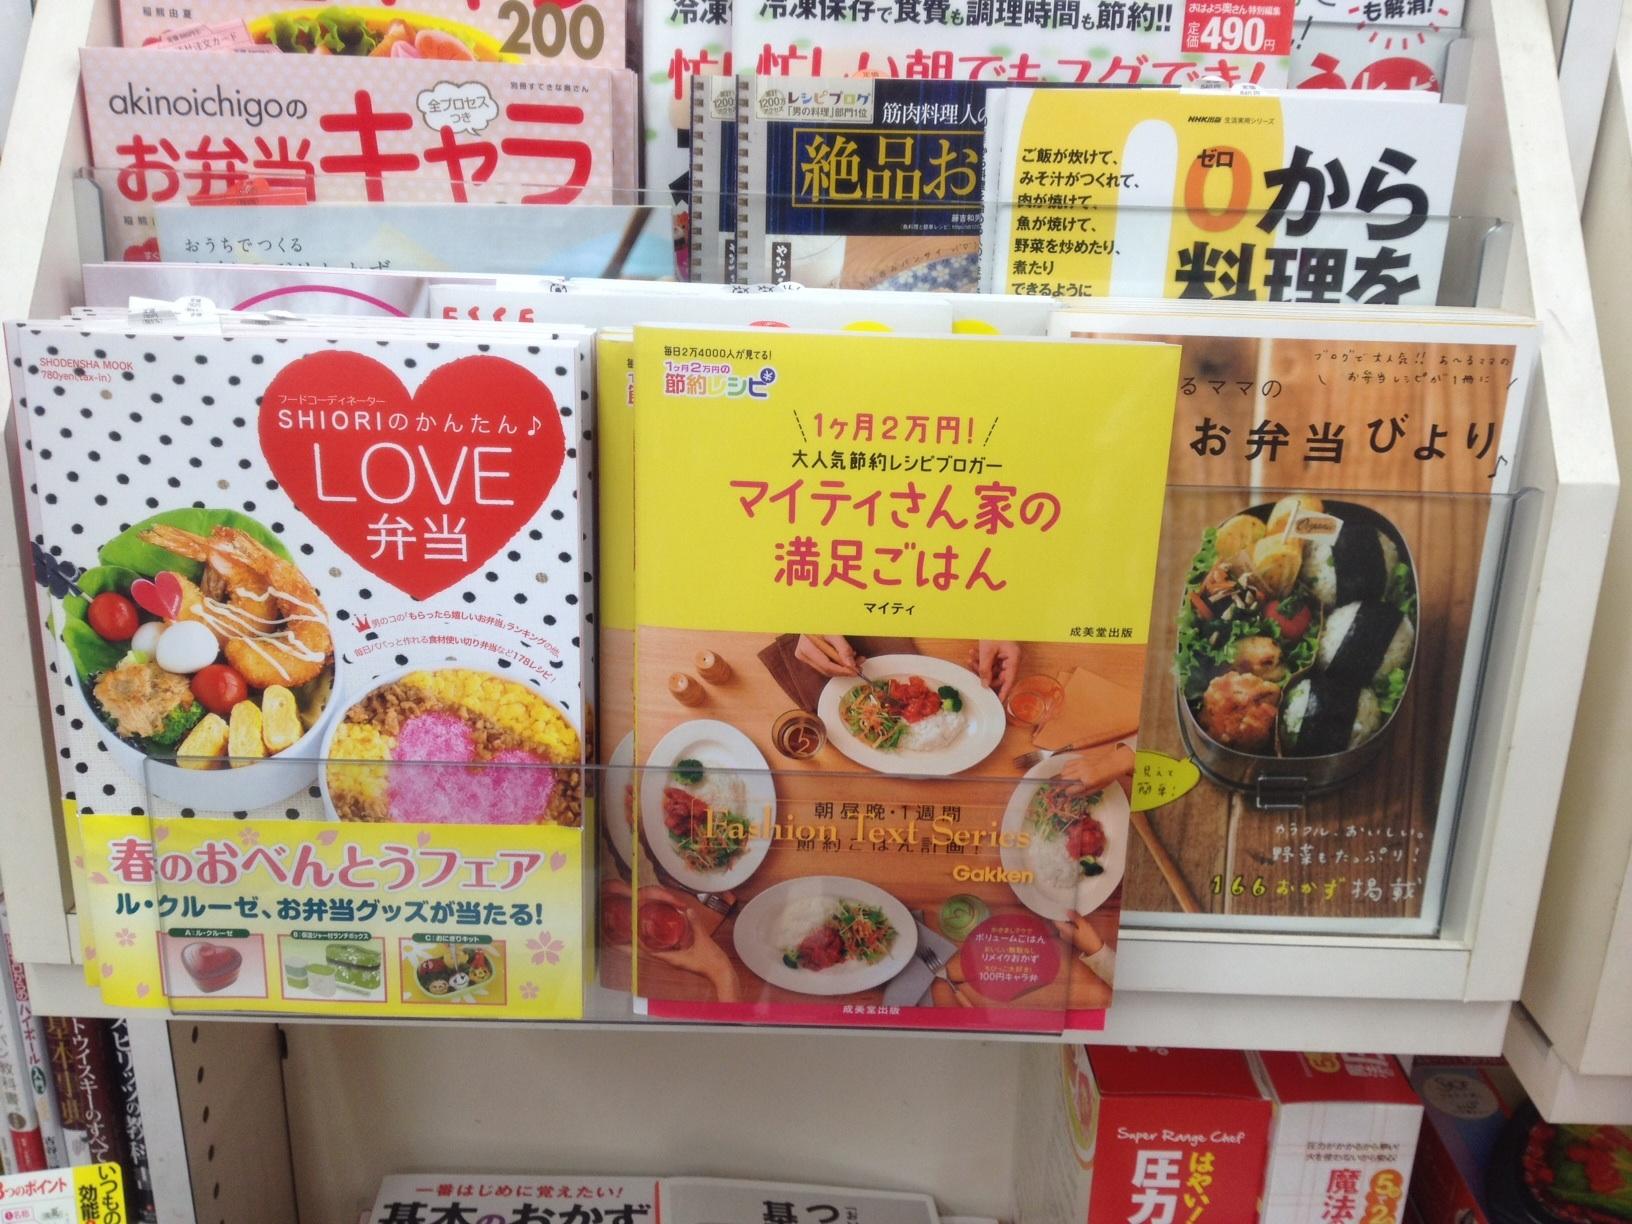 http://sorakikaku.com/maruyamamiki/files/0319-5.jpg